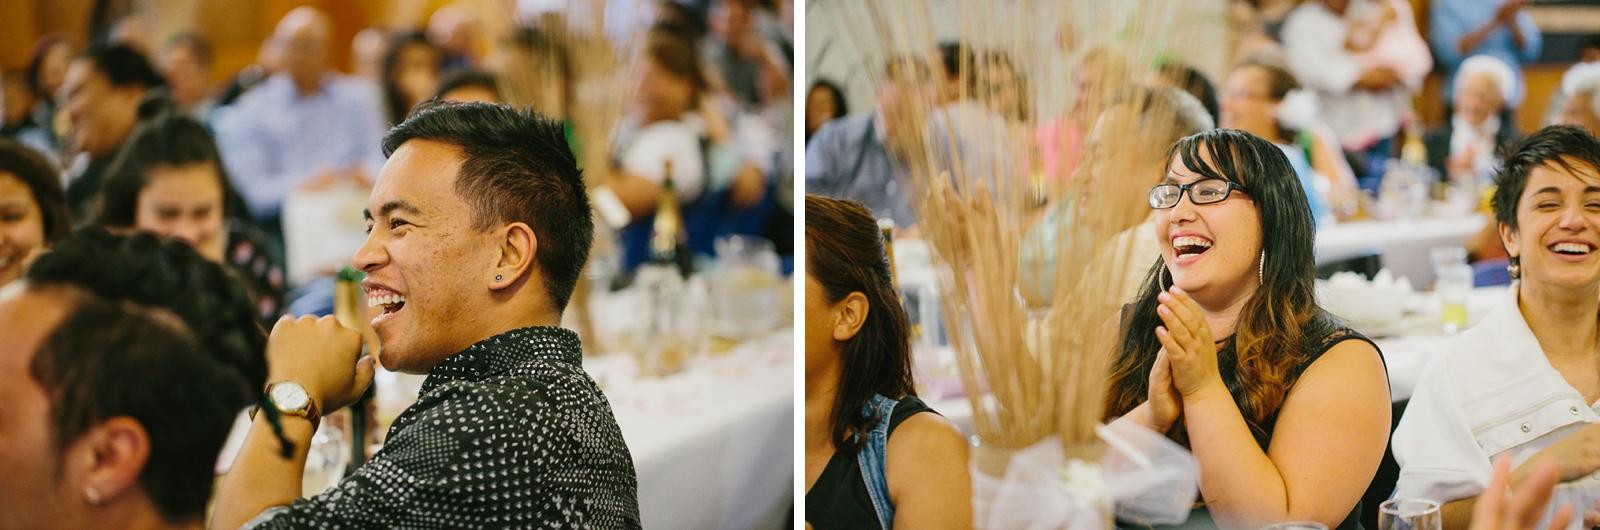 GabbyFiti_Auckland Wedding Photographer_Patty Lagera_0091.jpg